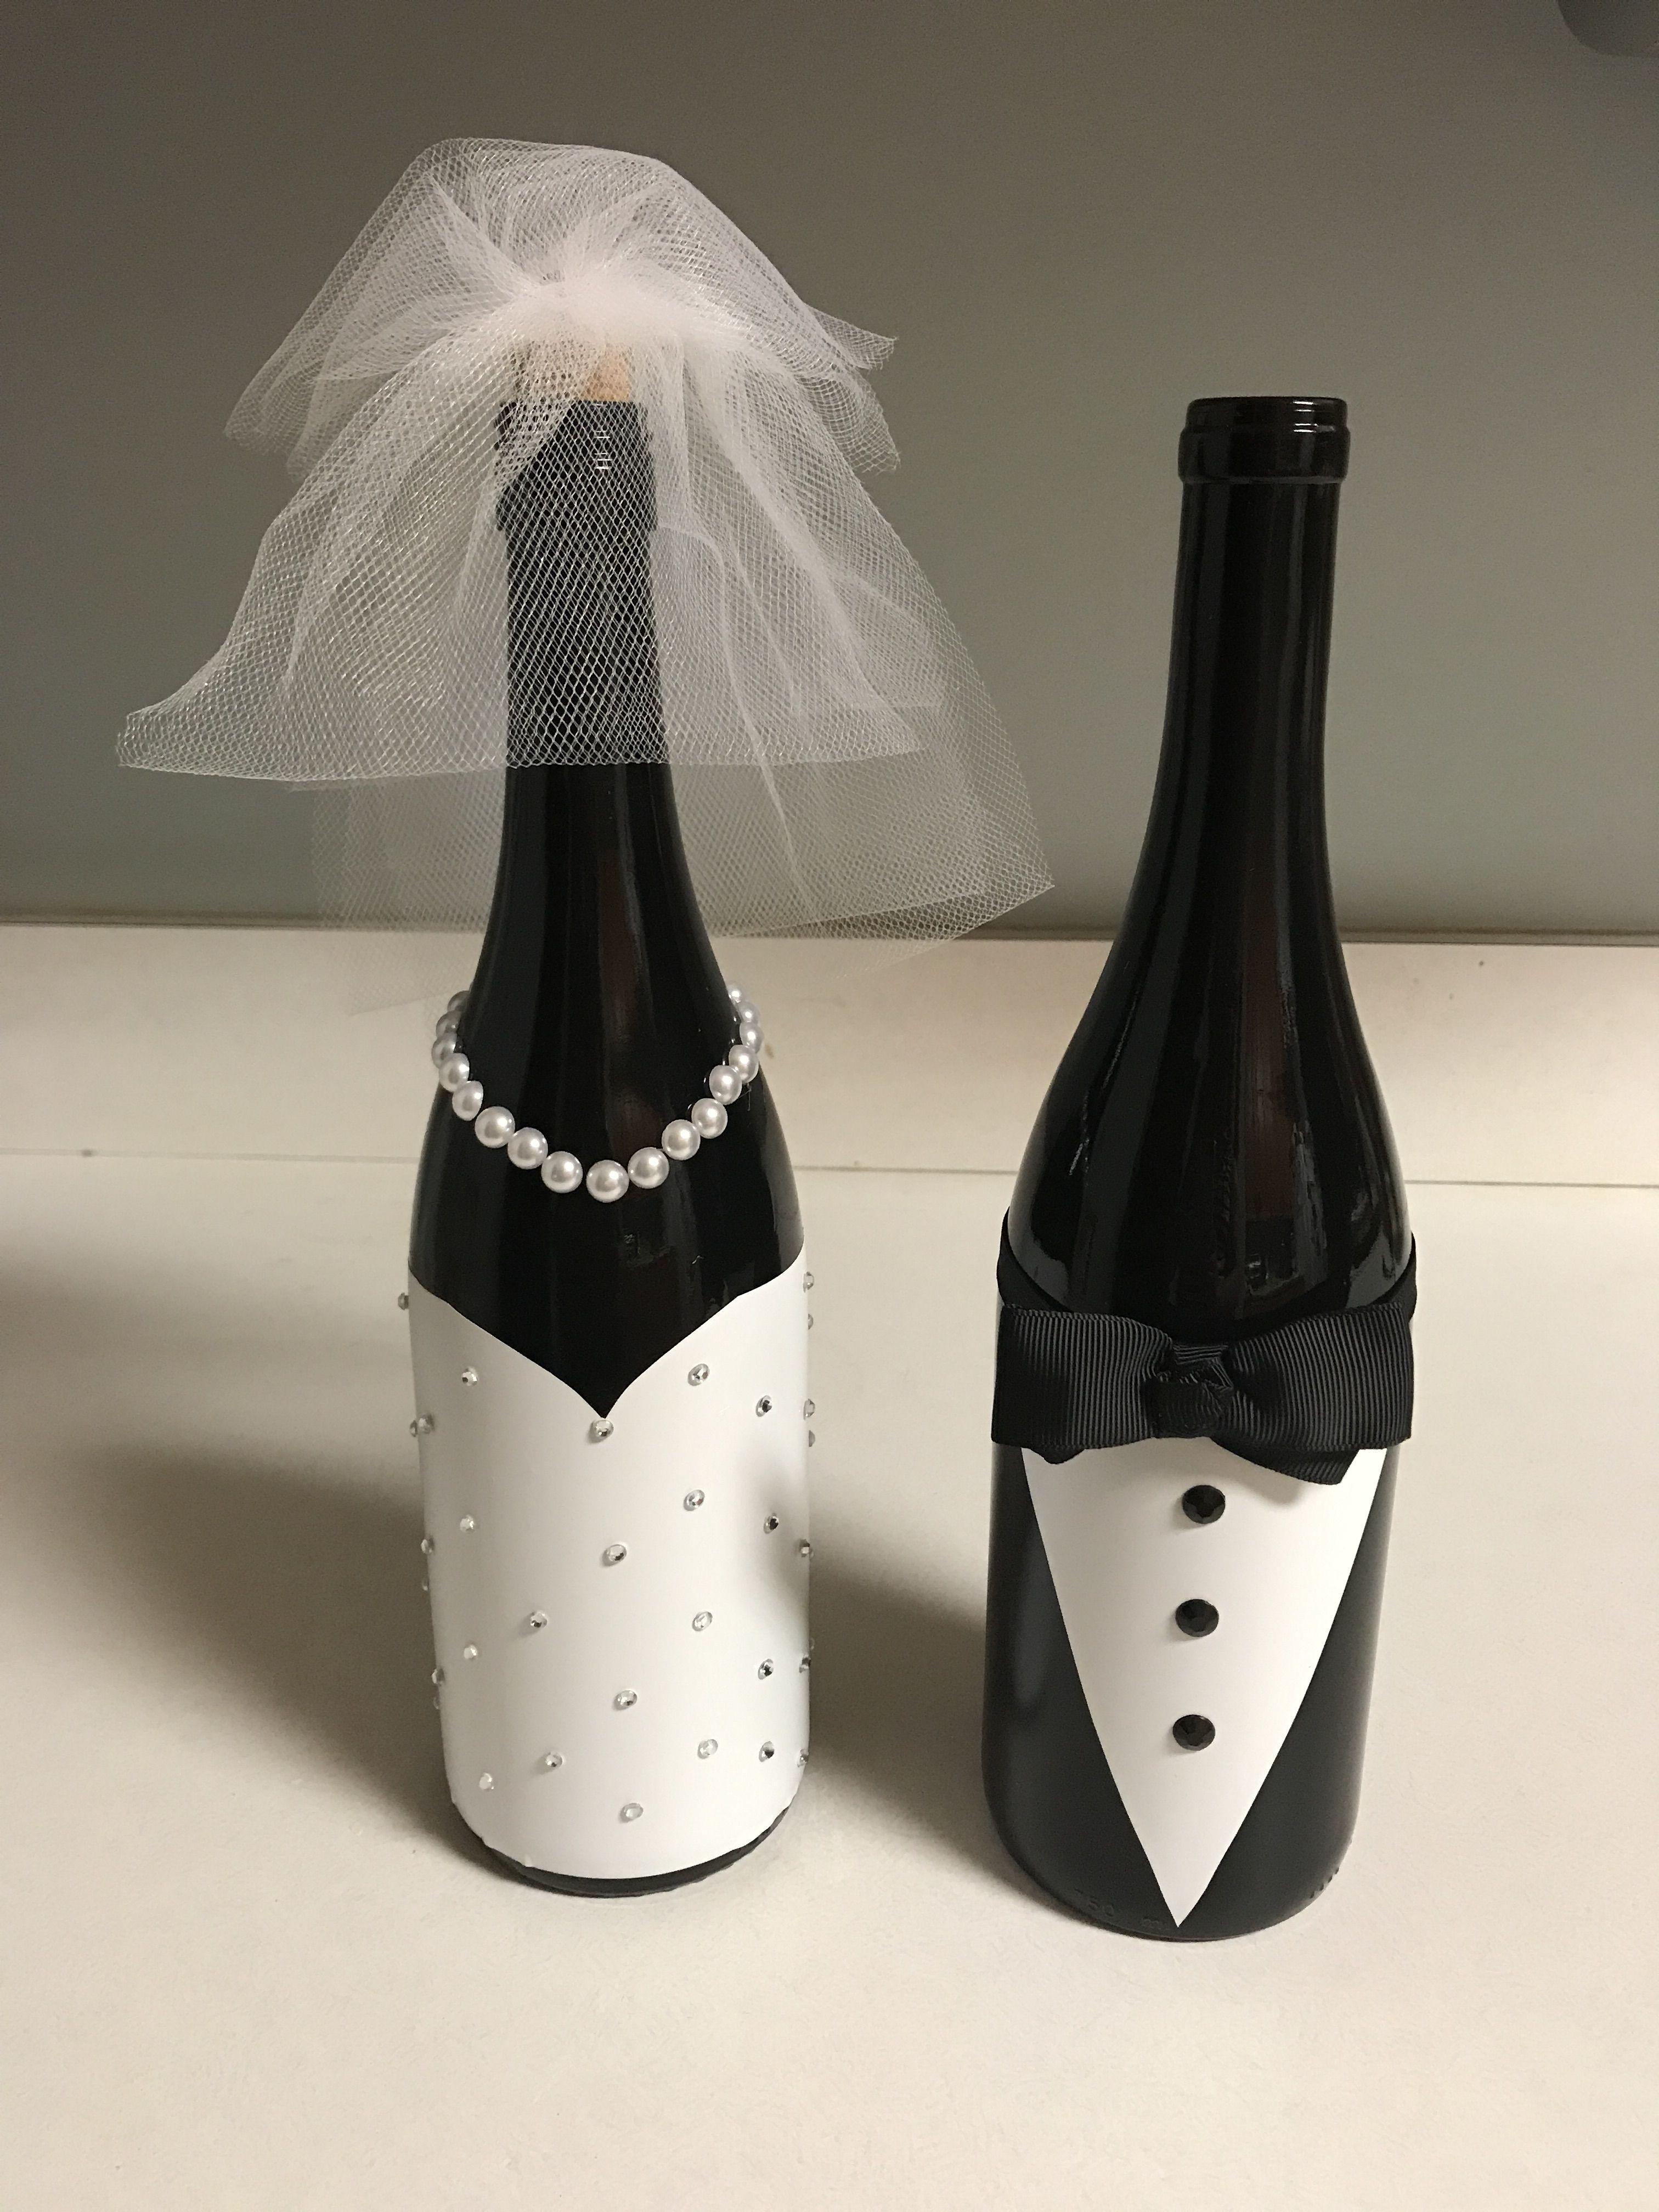 Idea By Julie Orozco On Glass Bottle Decor Wedding Bottles